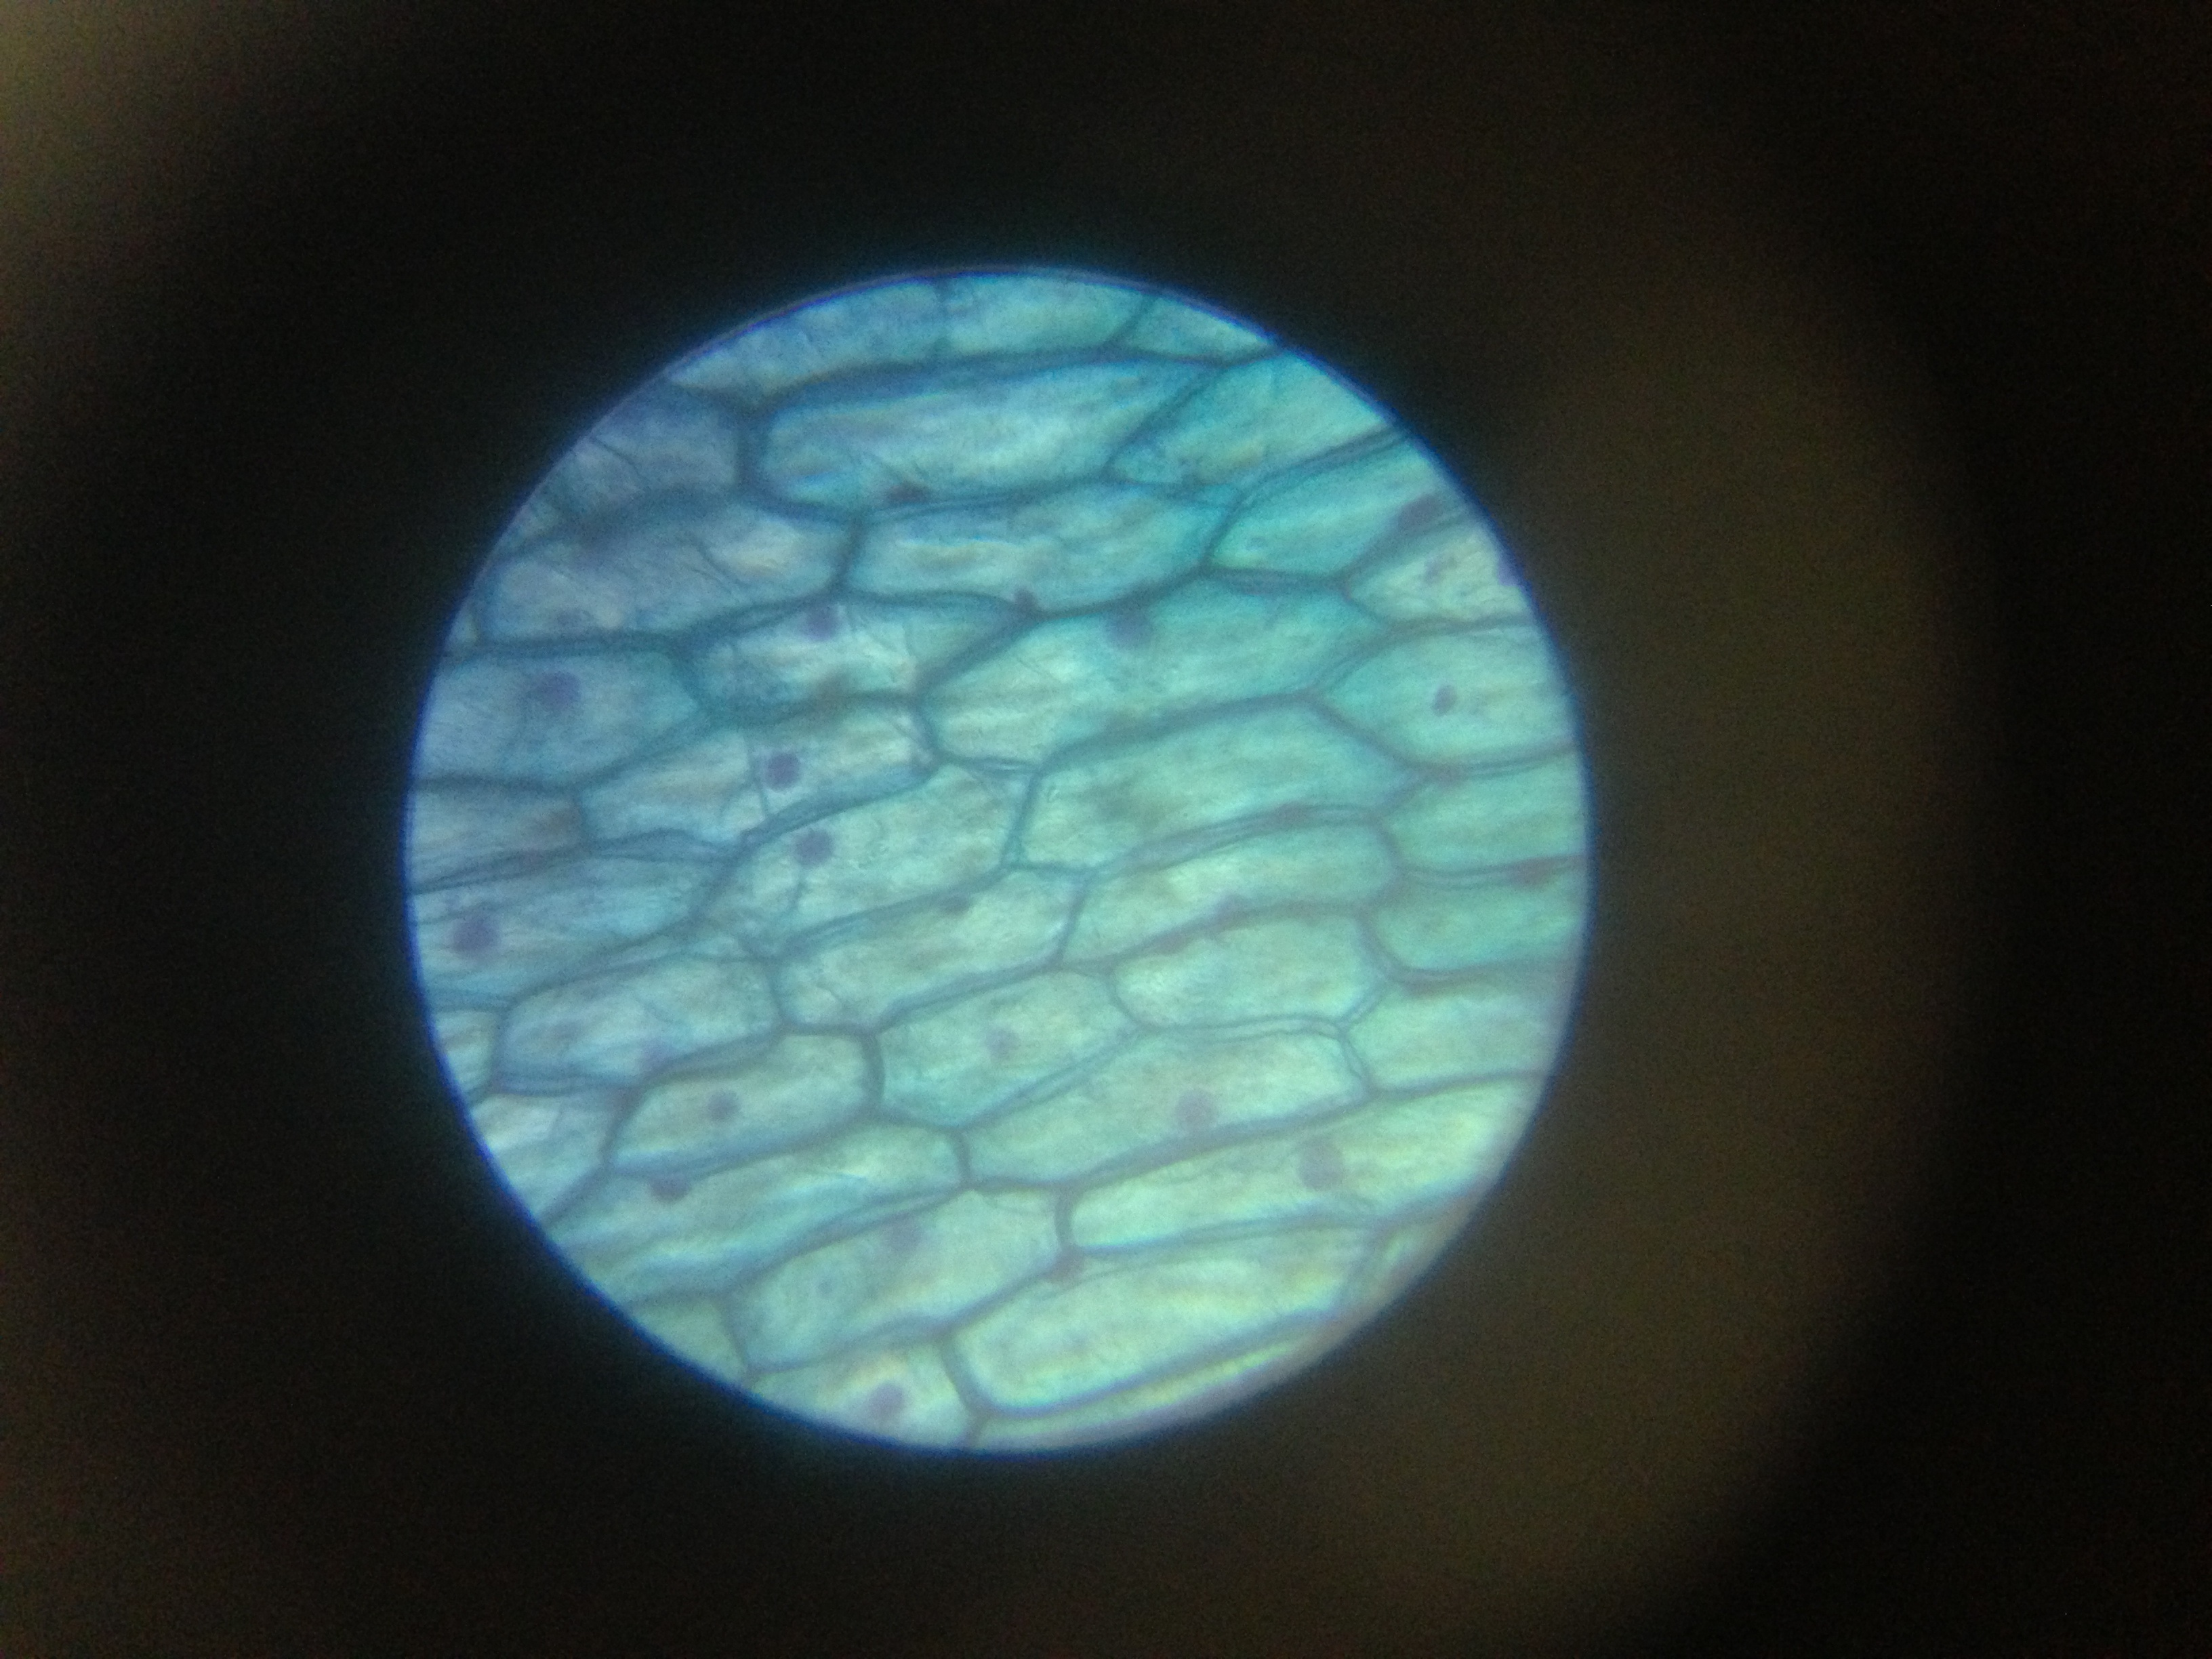 фото кожица лука под микроскопом